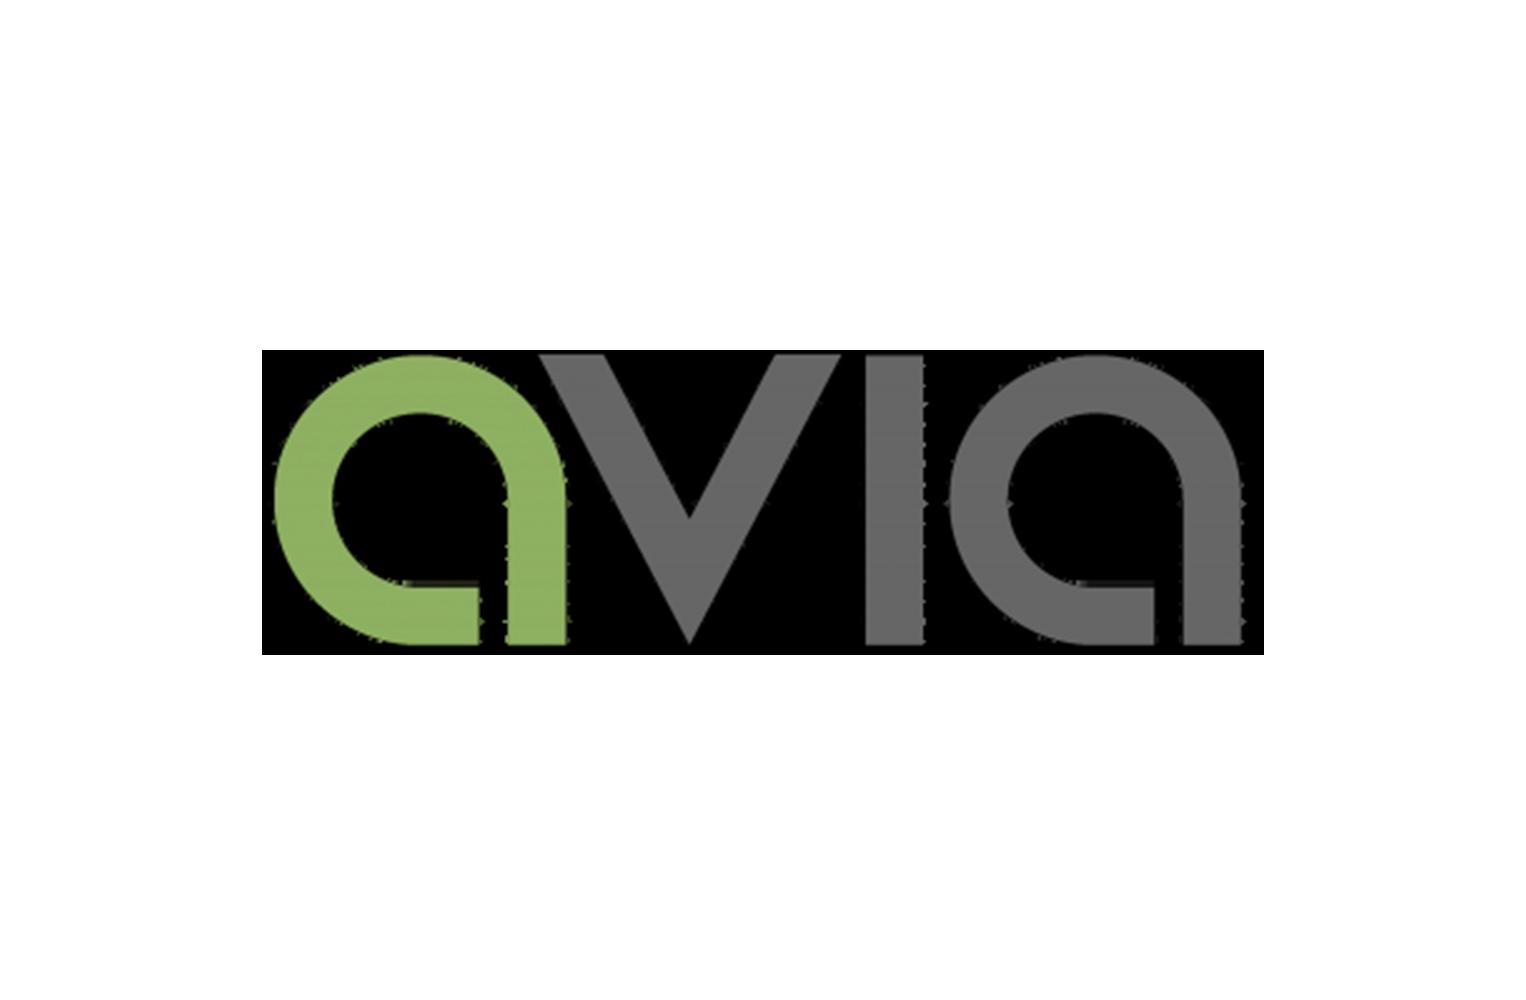 avia-400x126.png